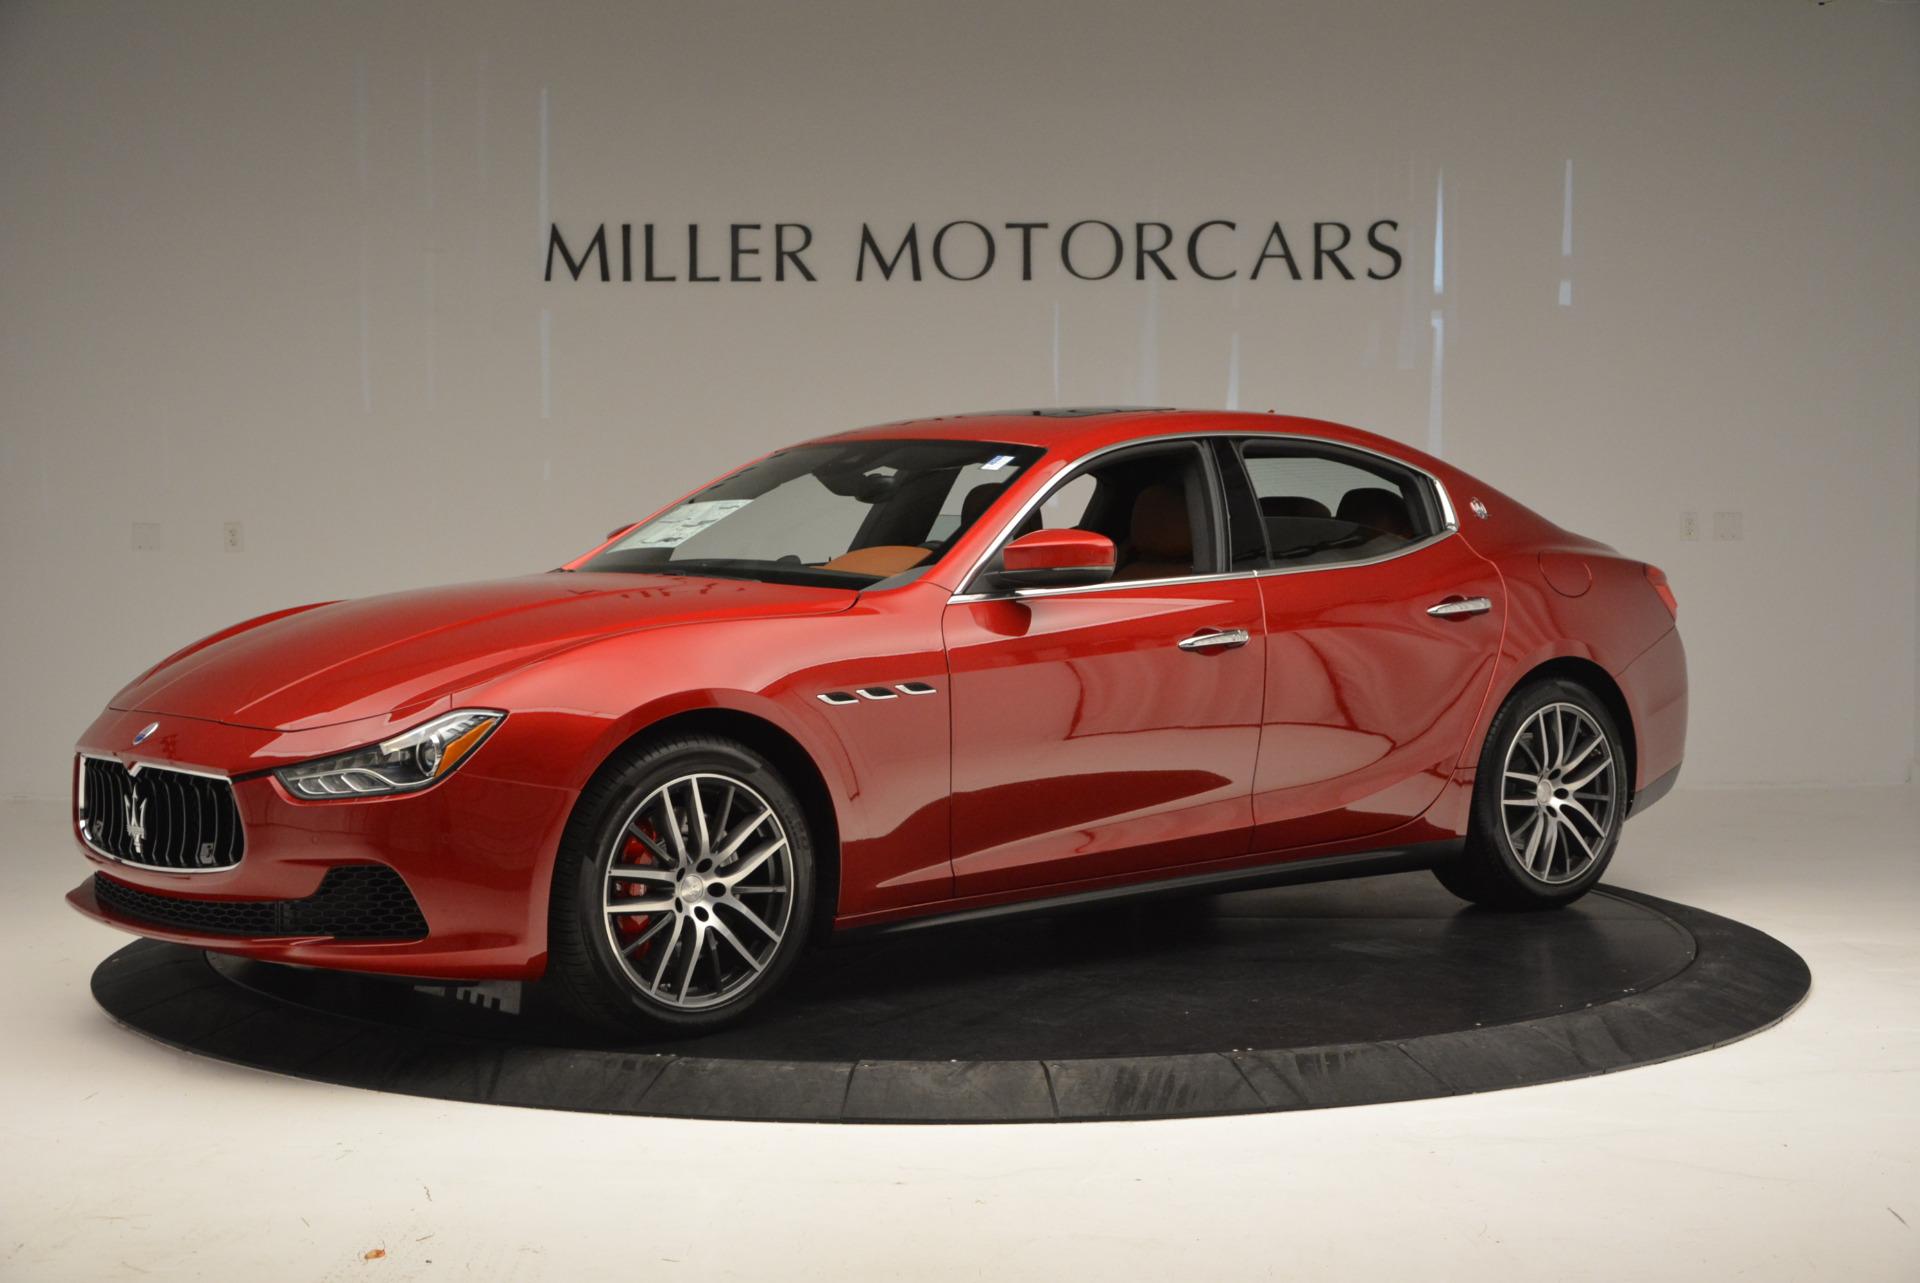 New 2017 Maserati Ghibli S Q4 For Sale () | Miller Motorcars Stock #M1658